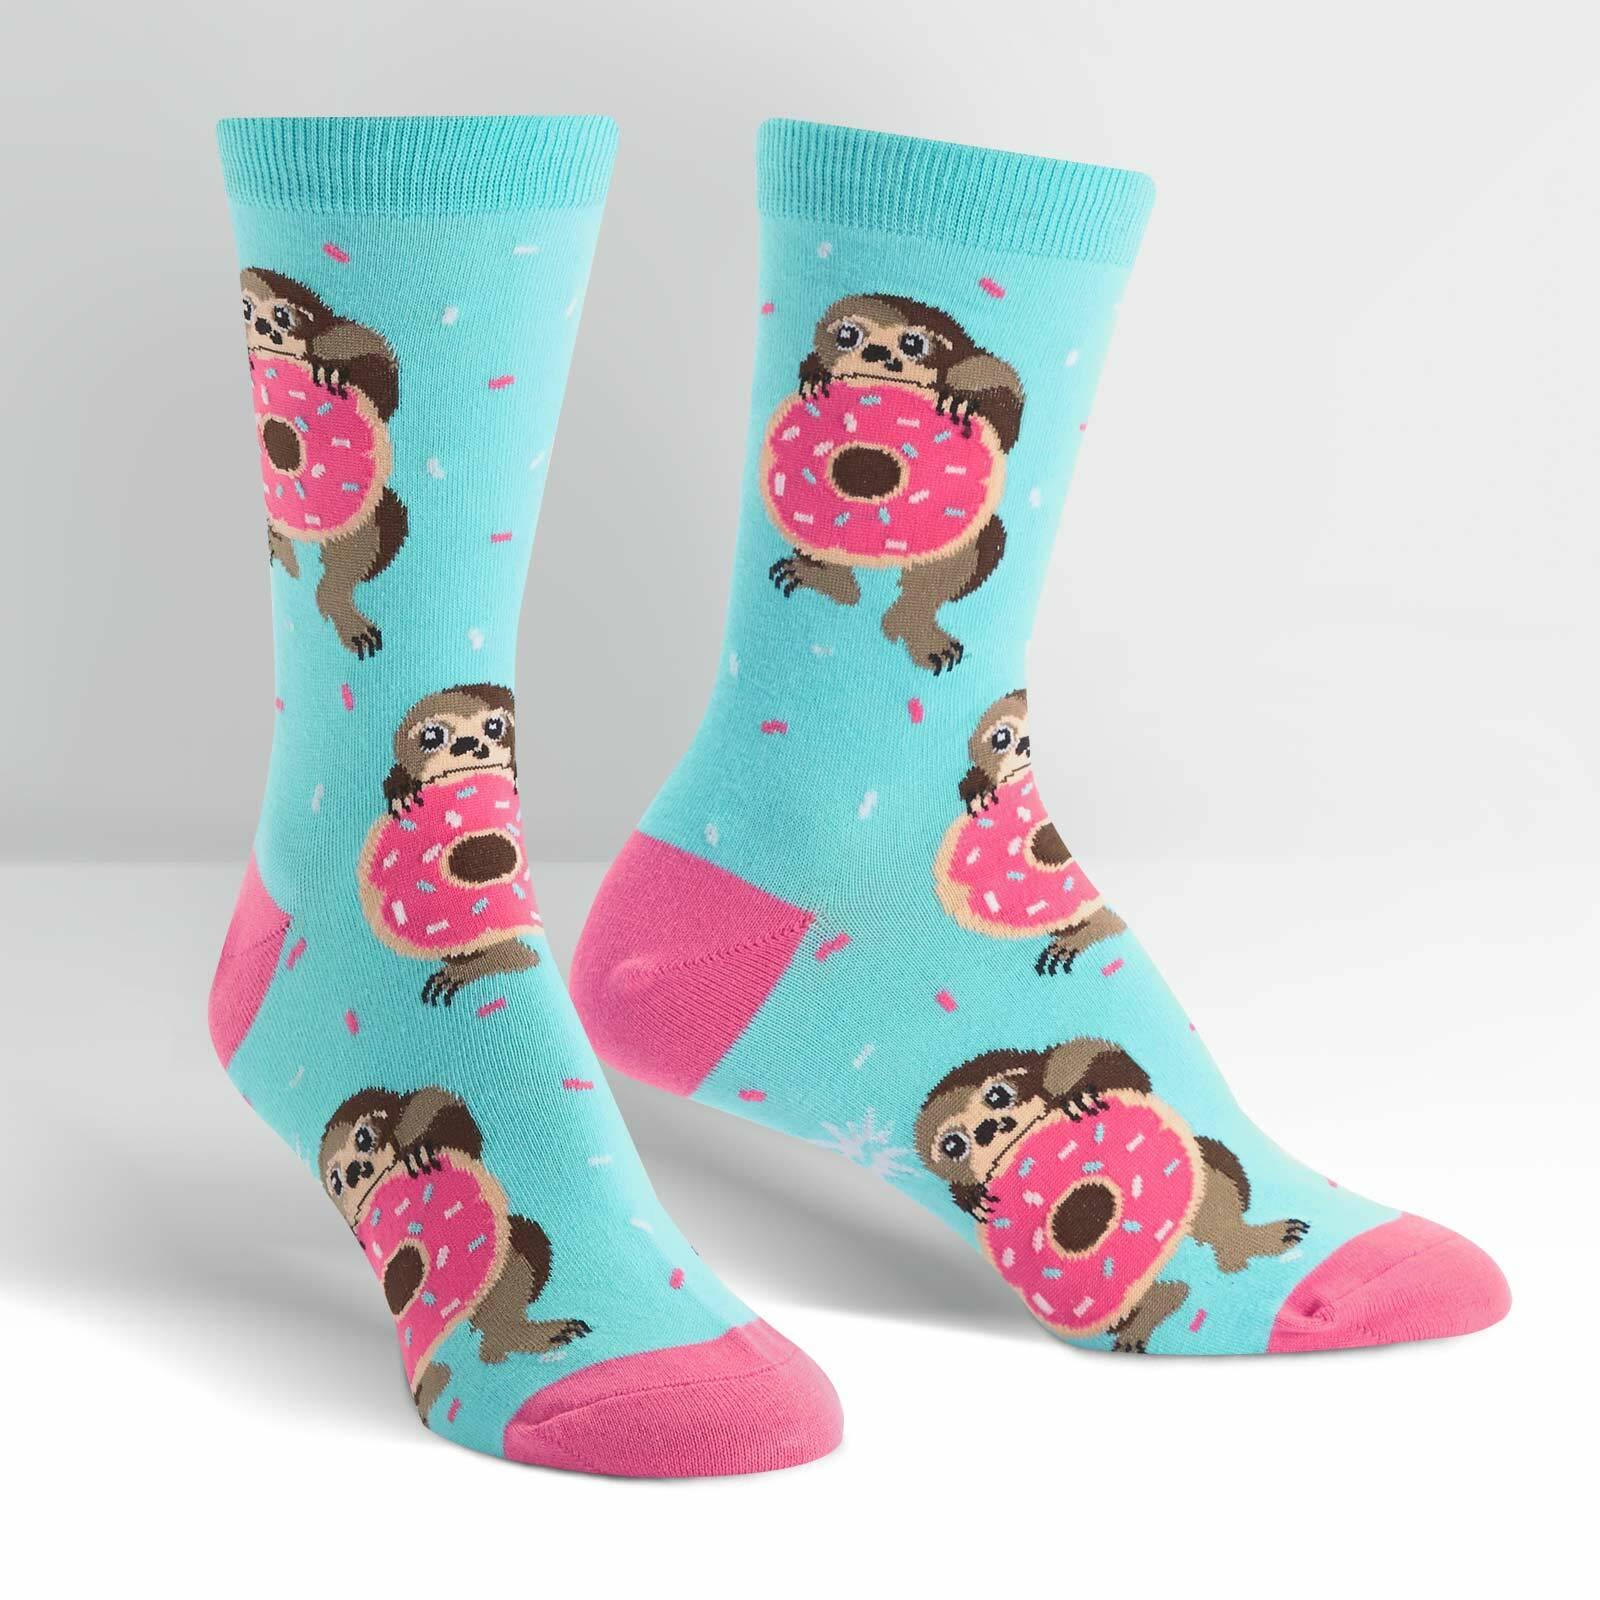 Light Blue variant of Snackin' Sloth - Sloth Crew Socks Blue - Women's